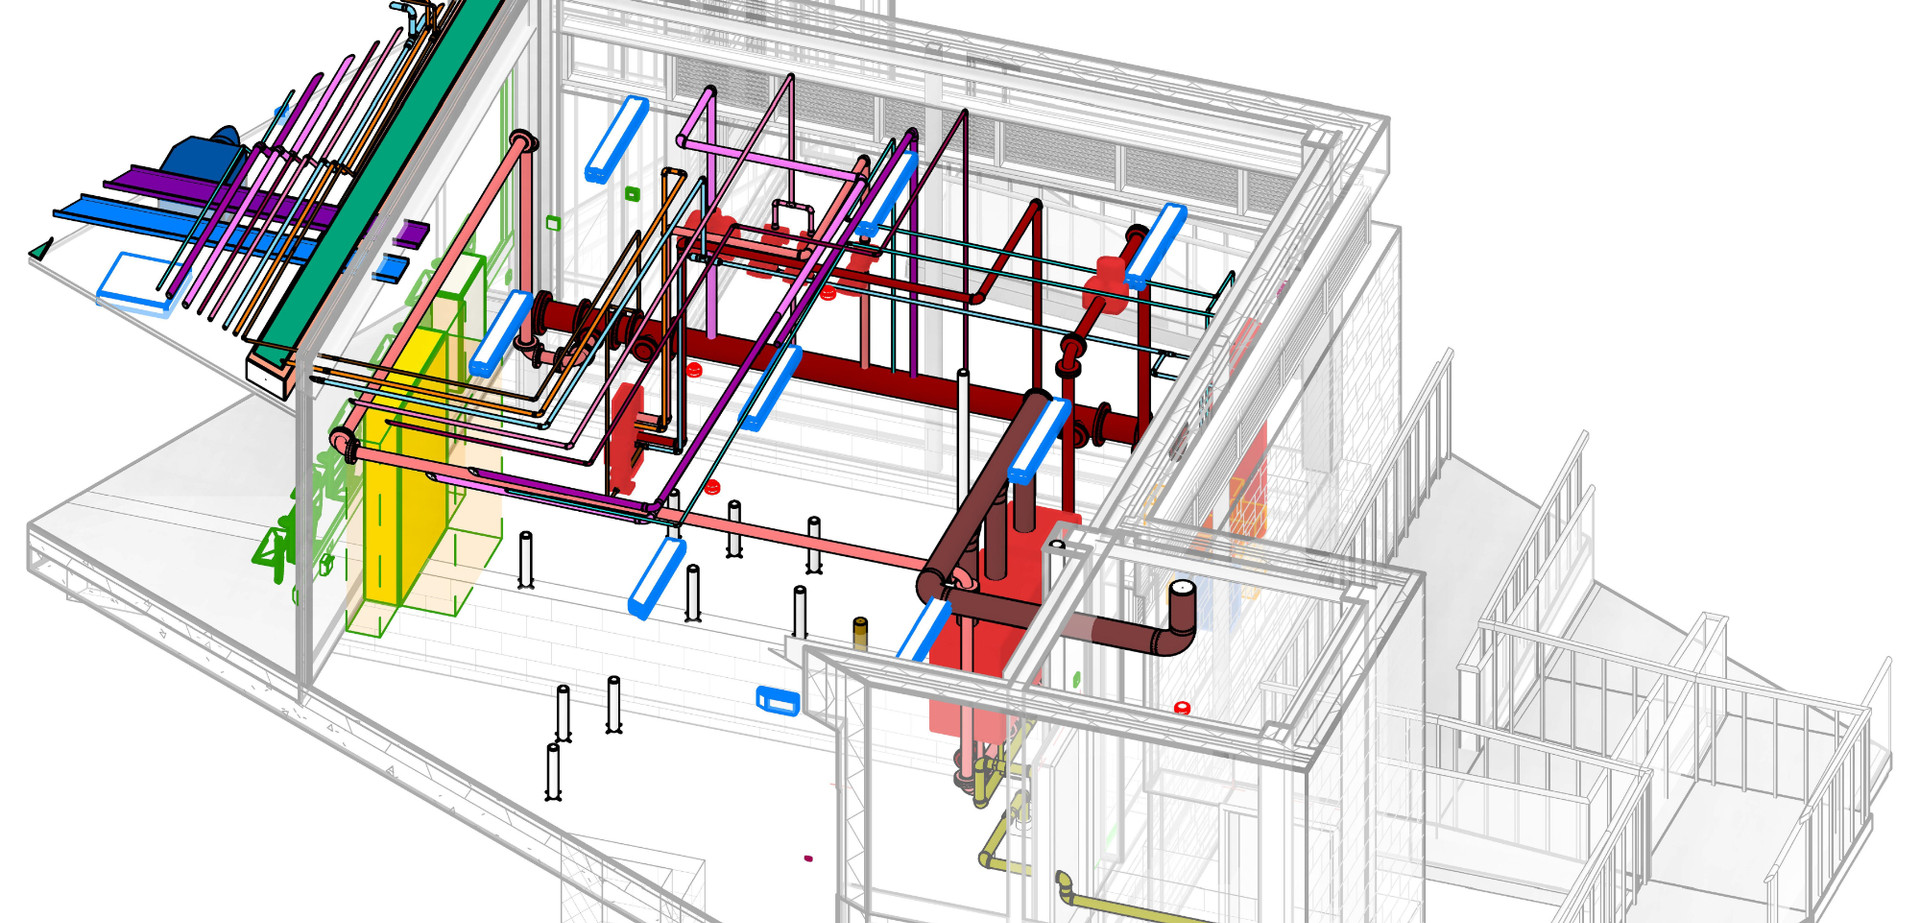 GxM_IoT_Plantroom_1.jpg